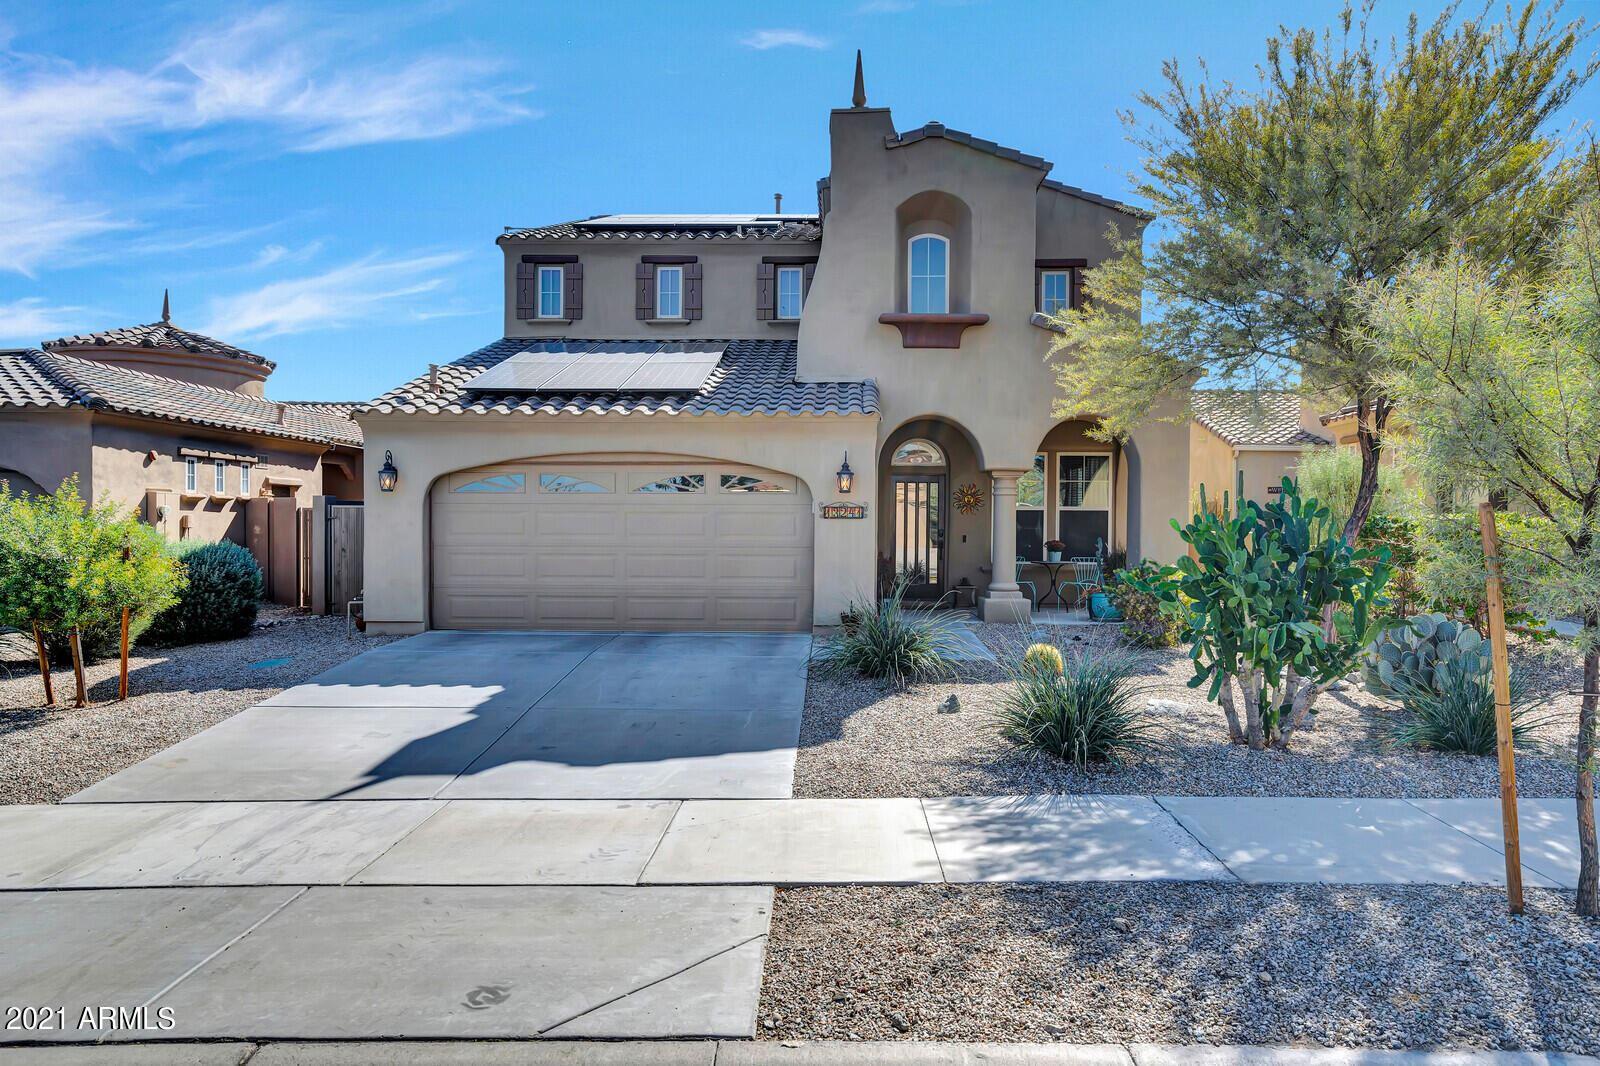 Photo of 13241 S 186TH Drive, Goodyear, AZ 85338 (MLS # 6305405)